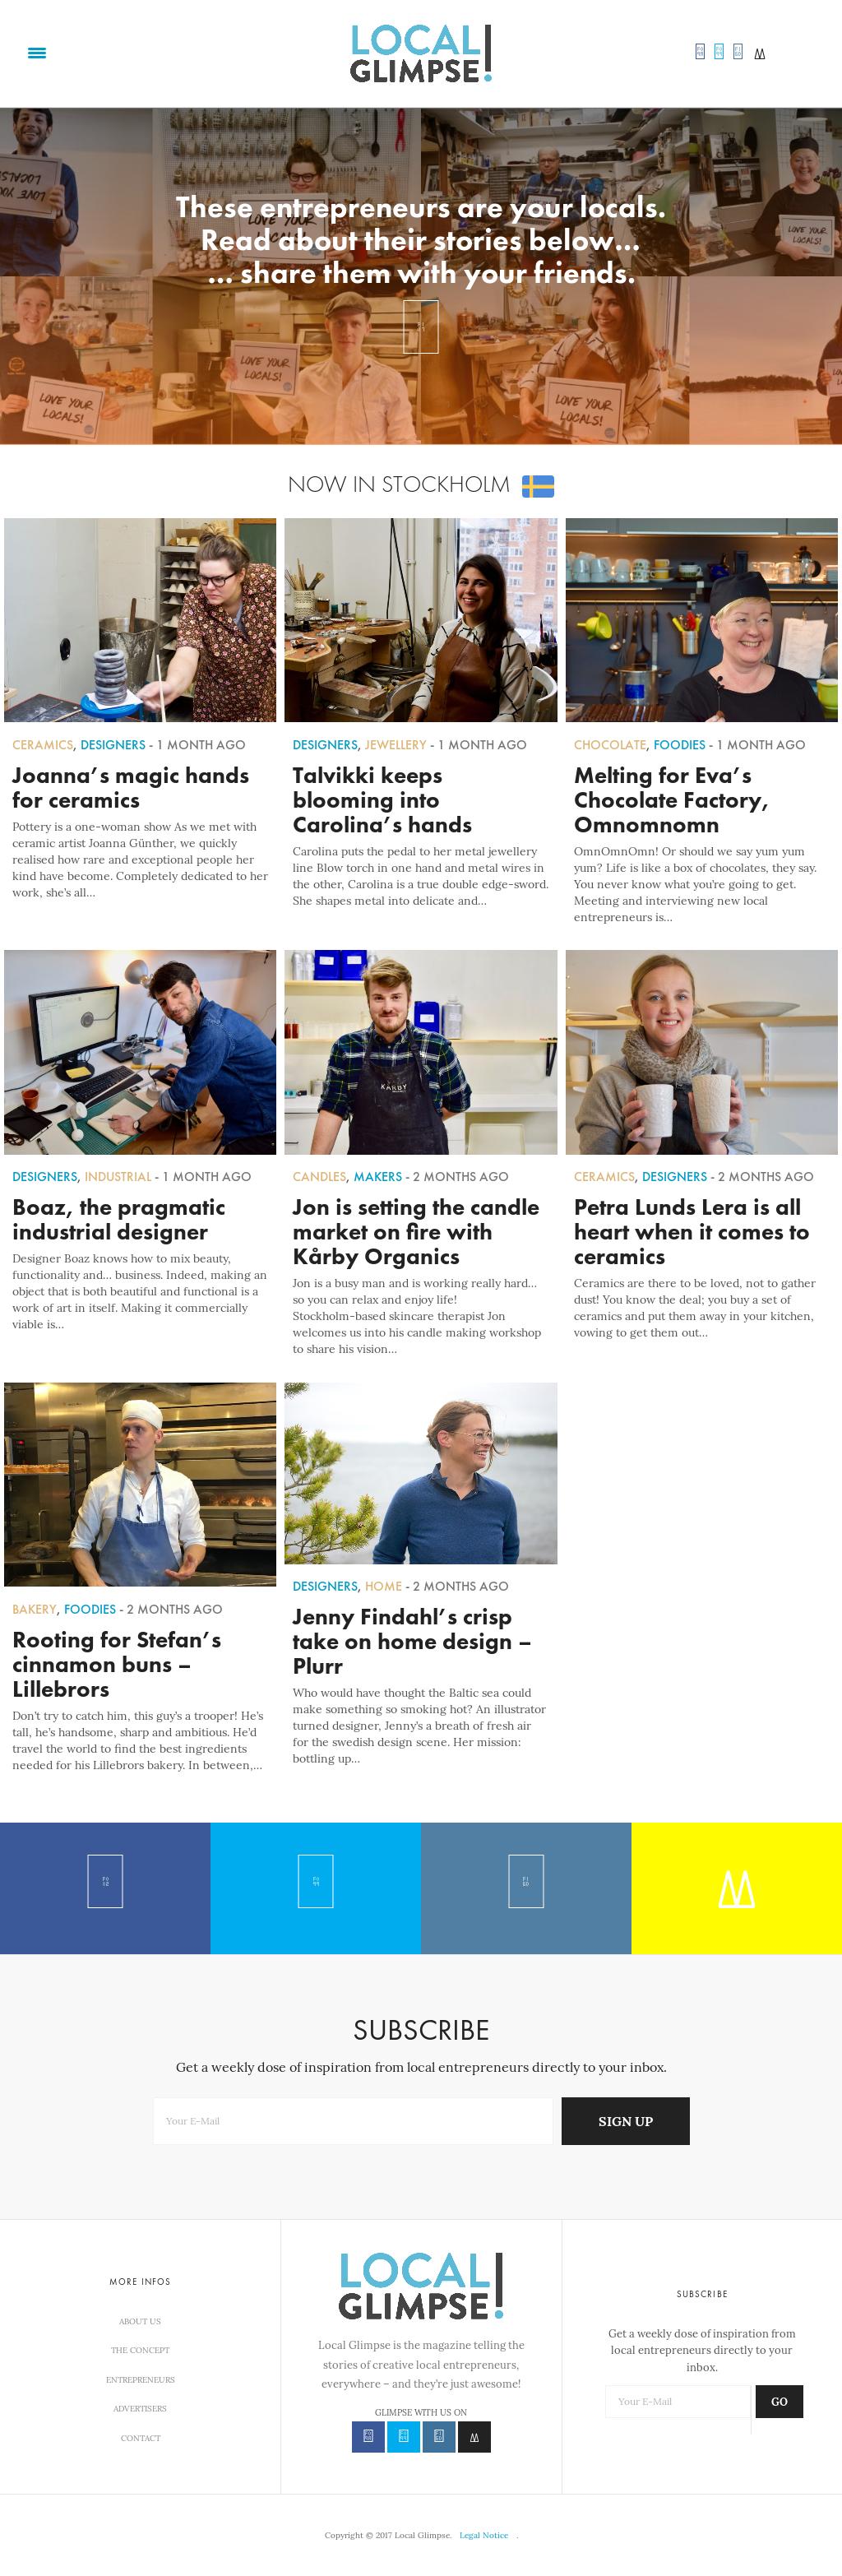 Local Glimpse Competitors, Revenue and Employees - Owler Company Profile